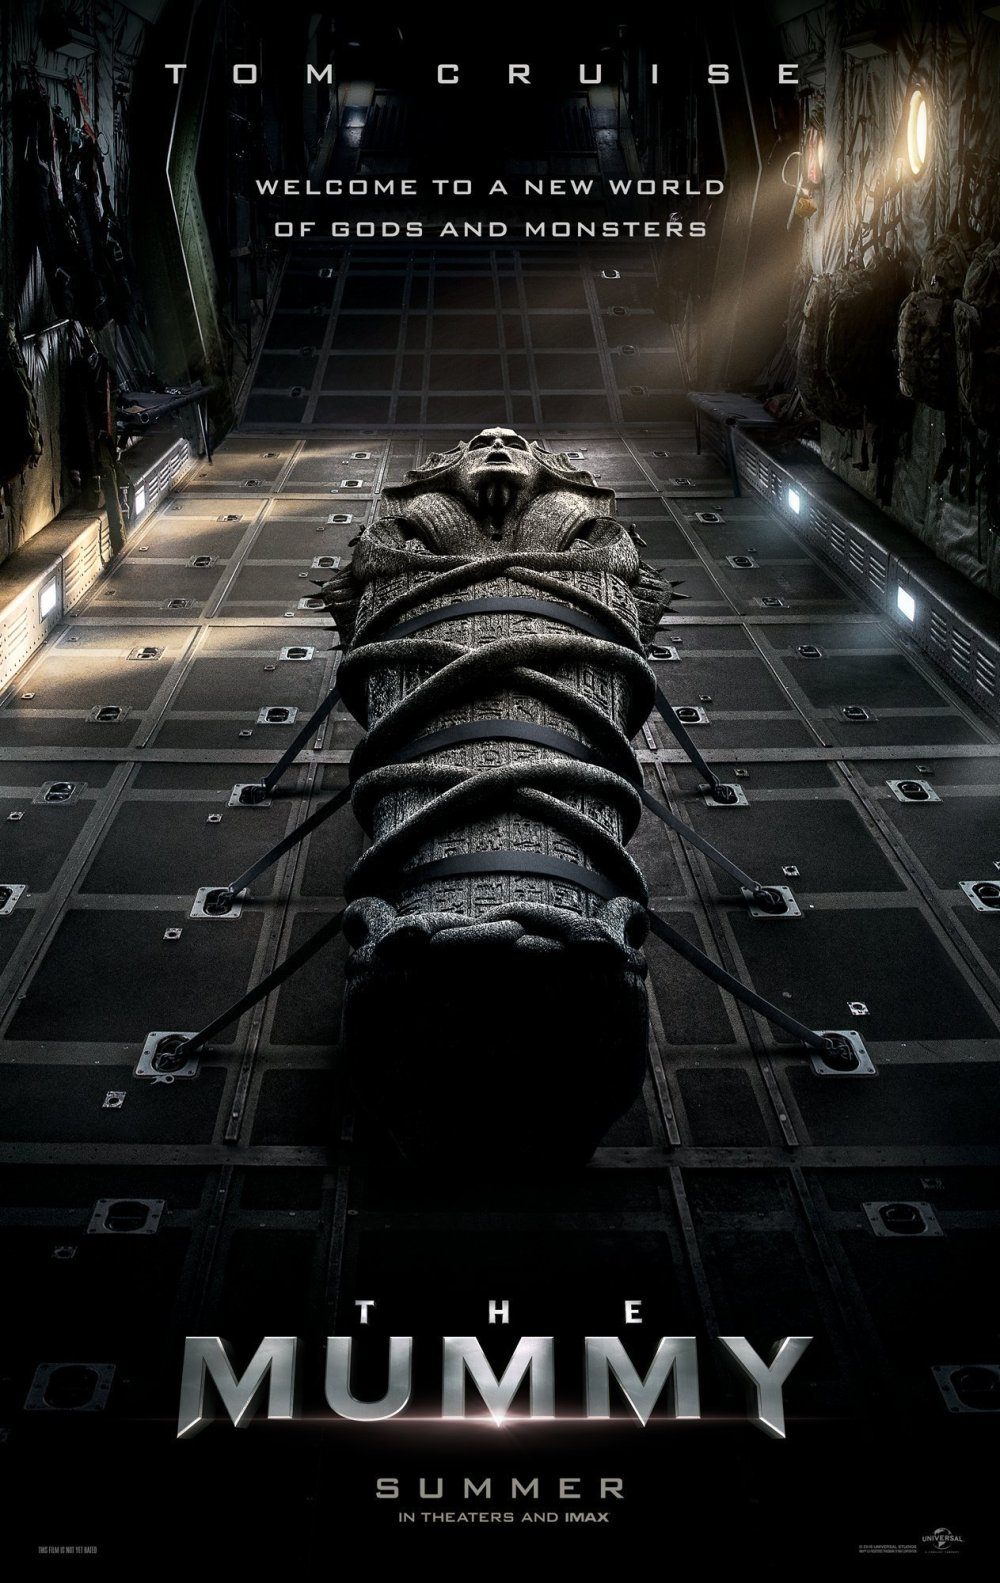 mummia-the-mummy-2016-monster-movie-italia